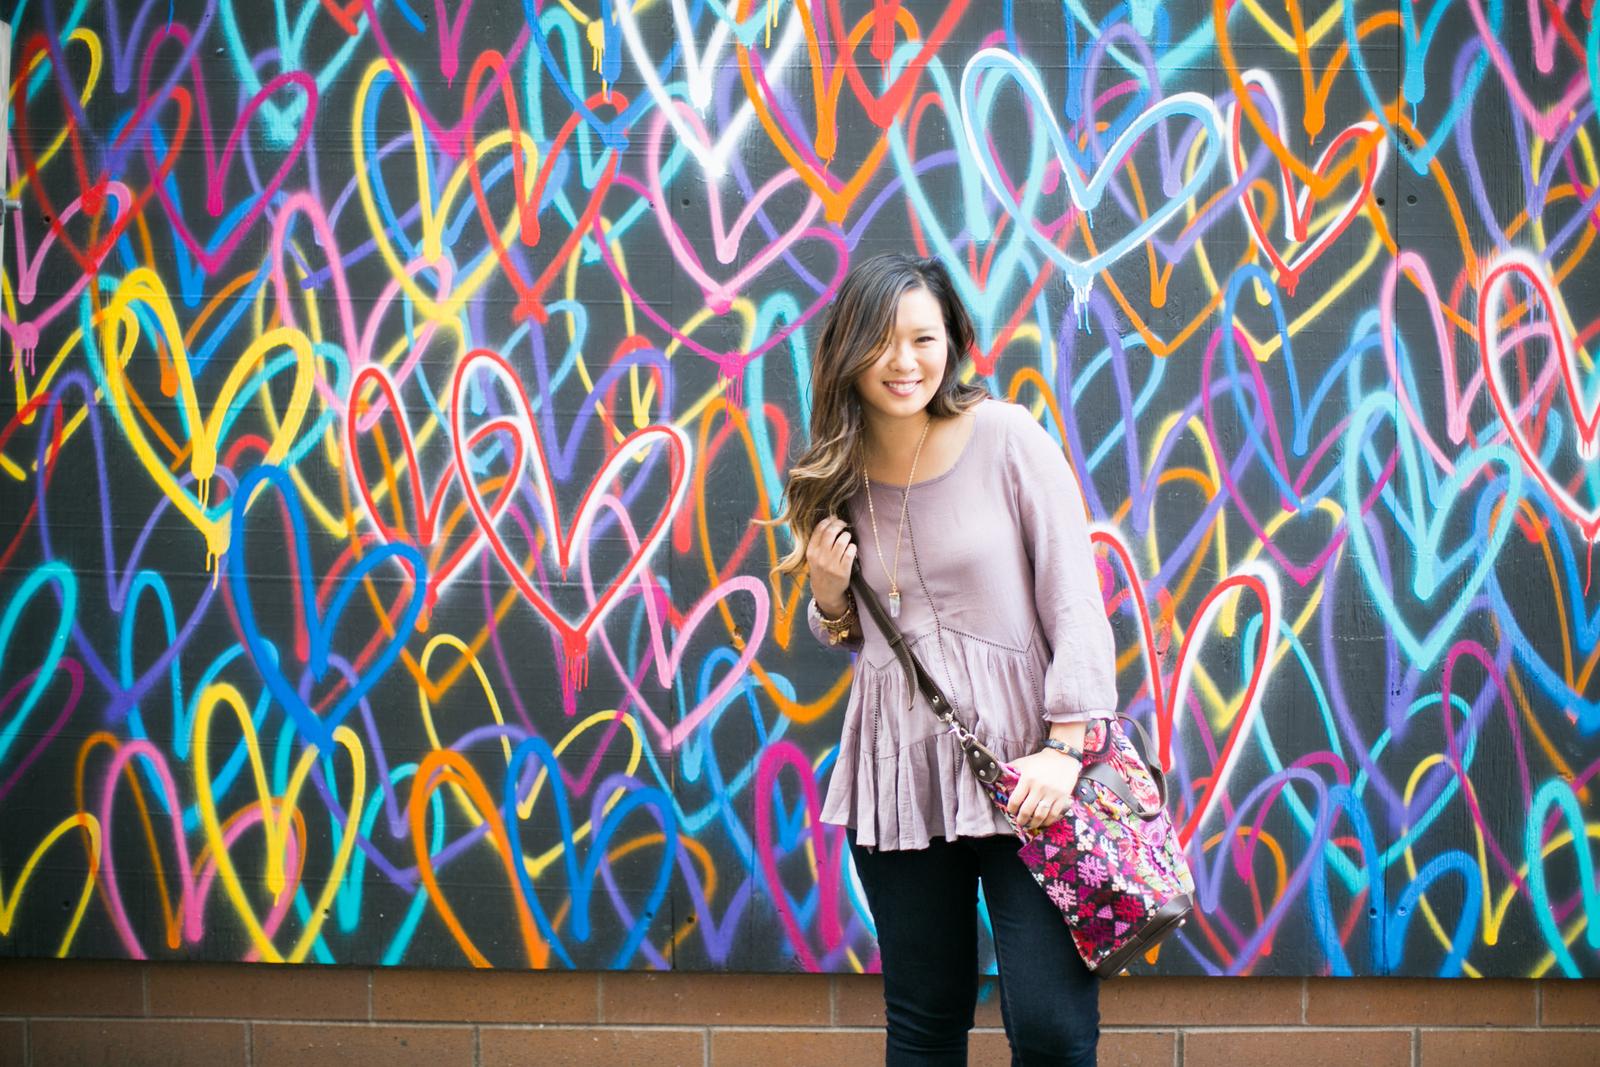 Chicago heart wall fashion